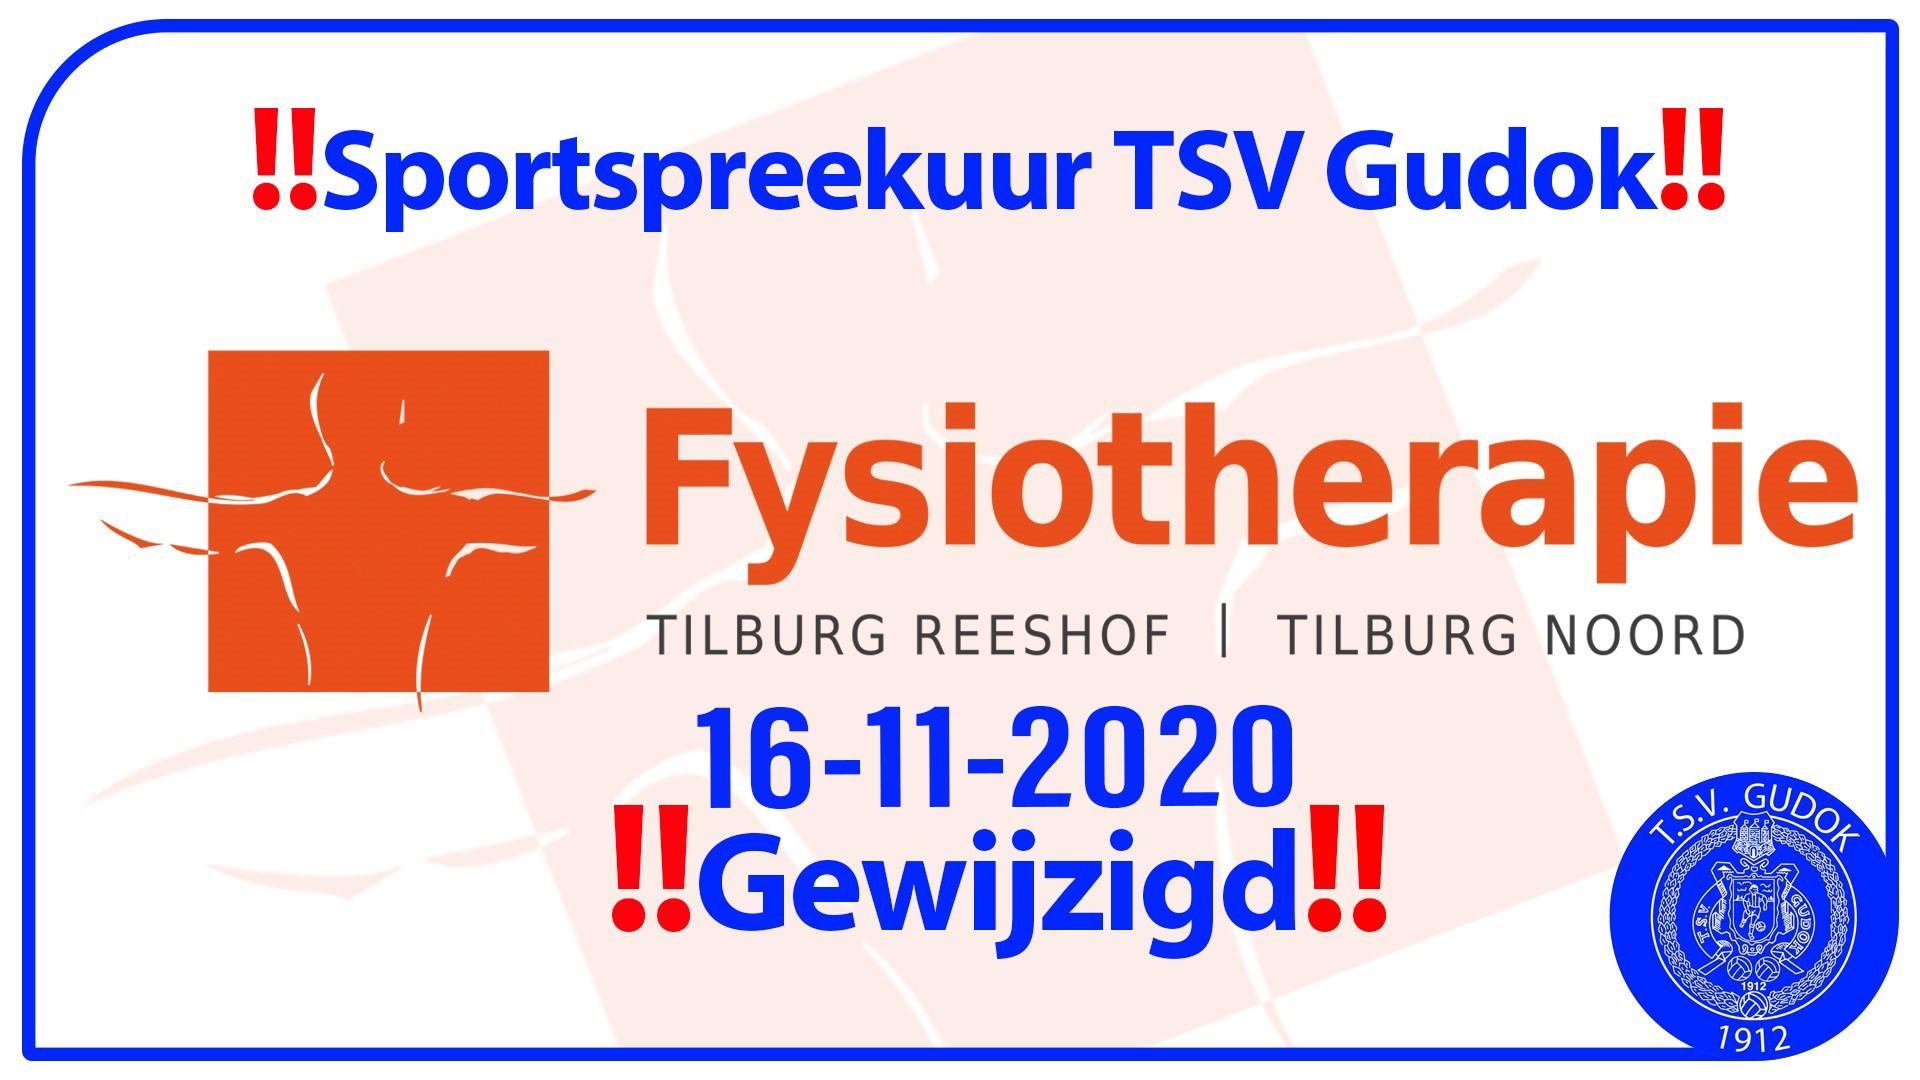 ‼️ Sportspreekuur TSV Gudok gewijzigd ‼️